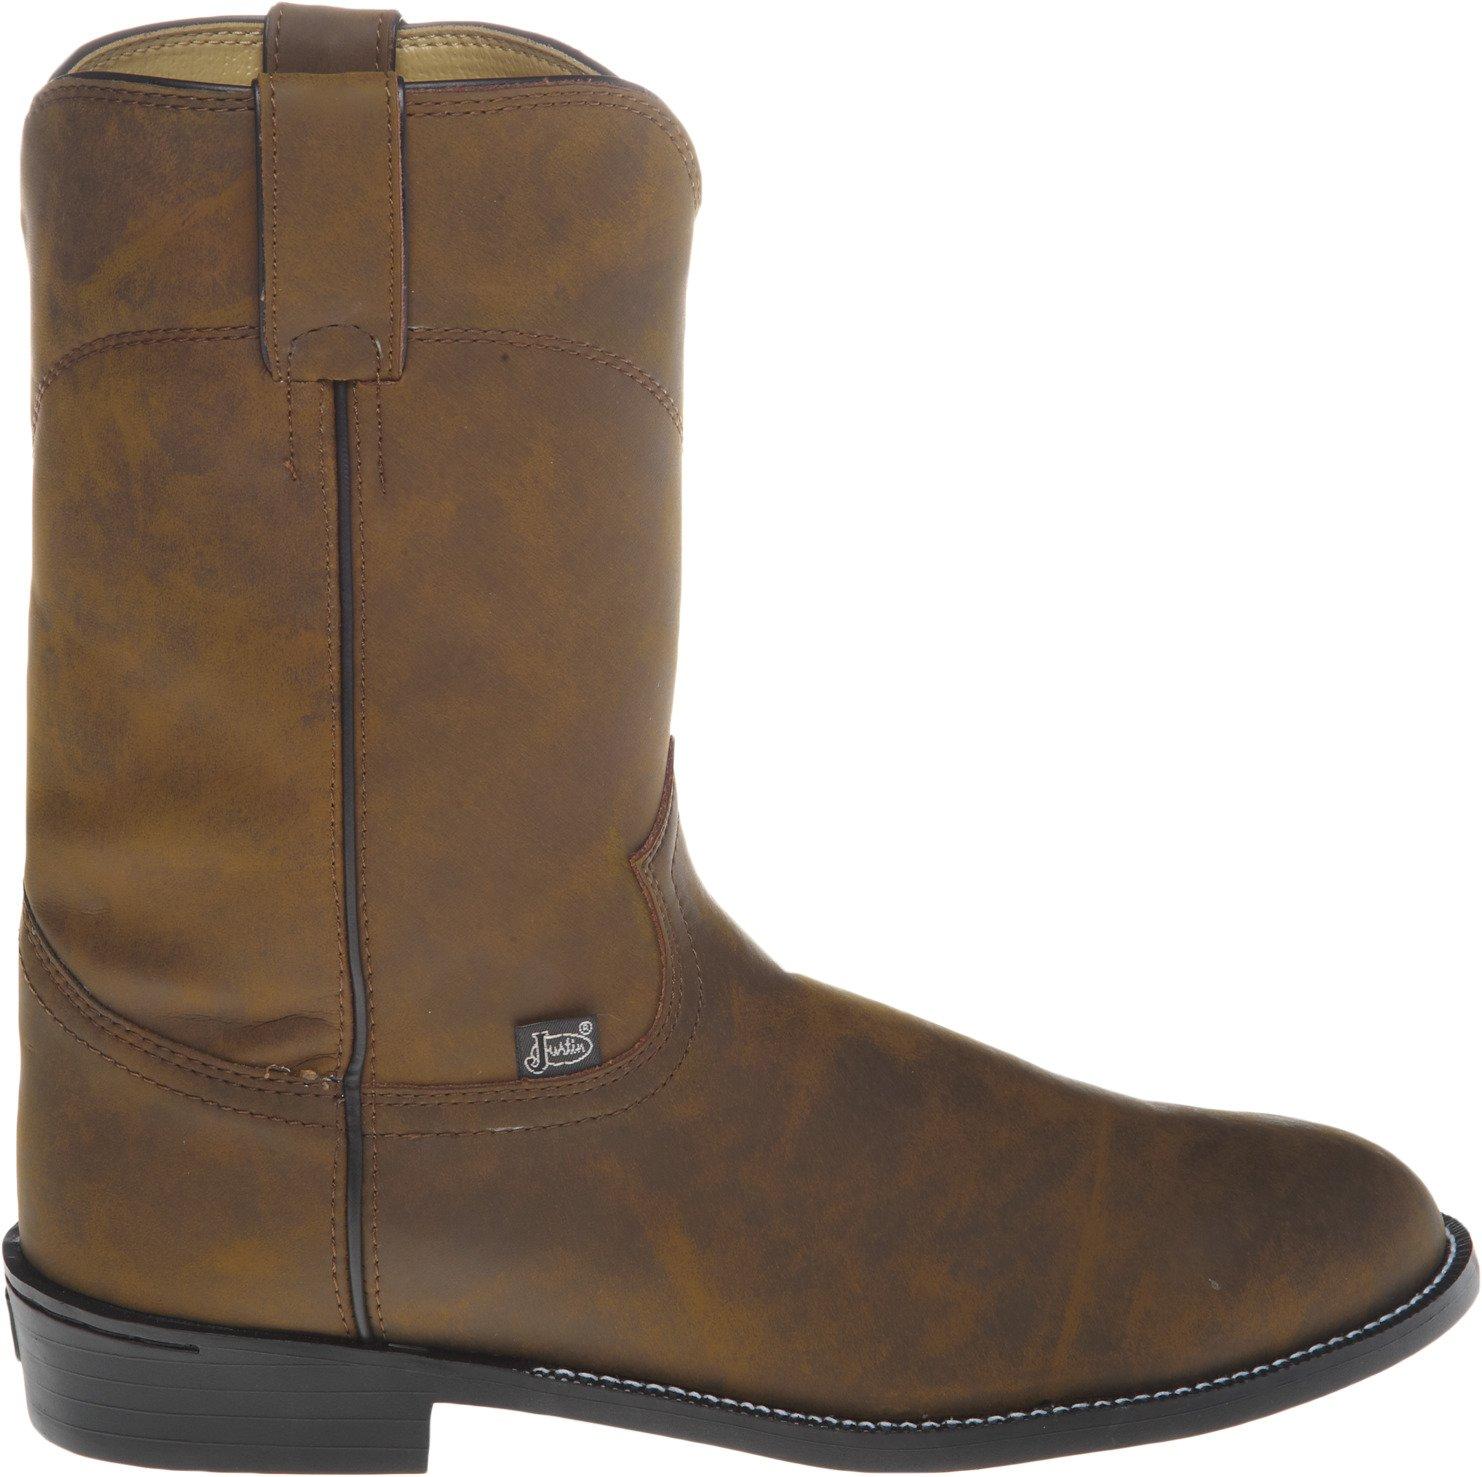 Justin Men's Roper Apache Western Boots